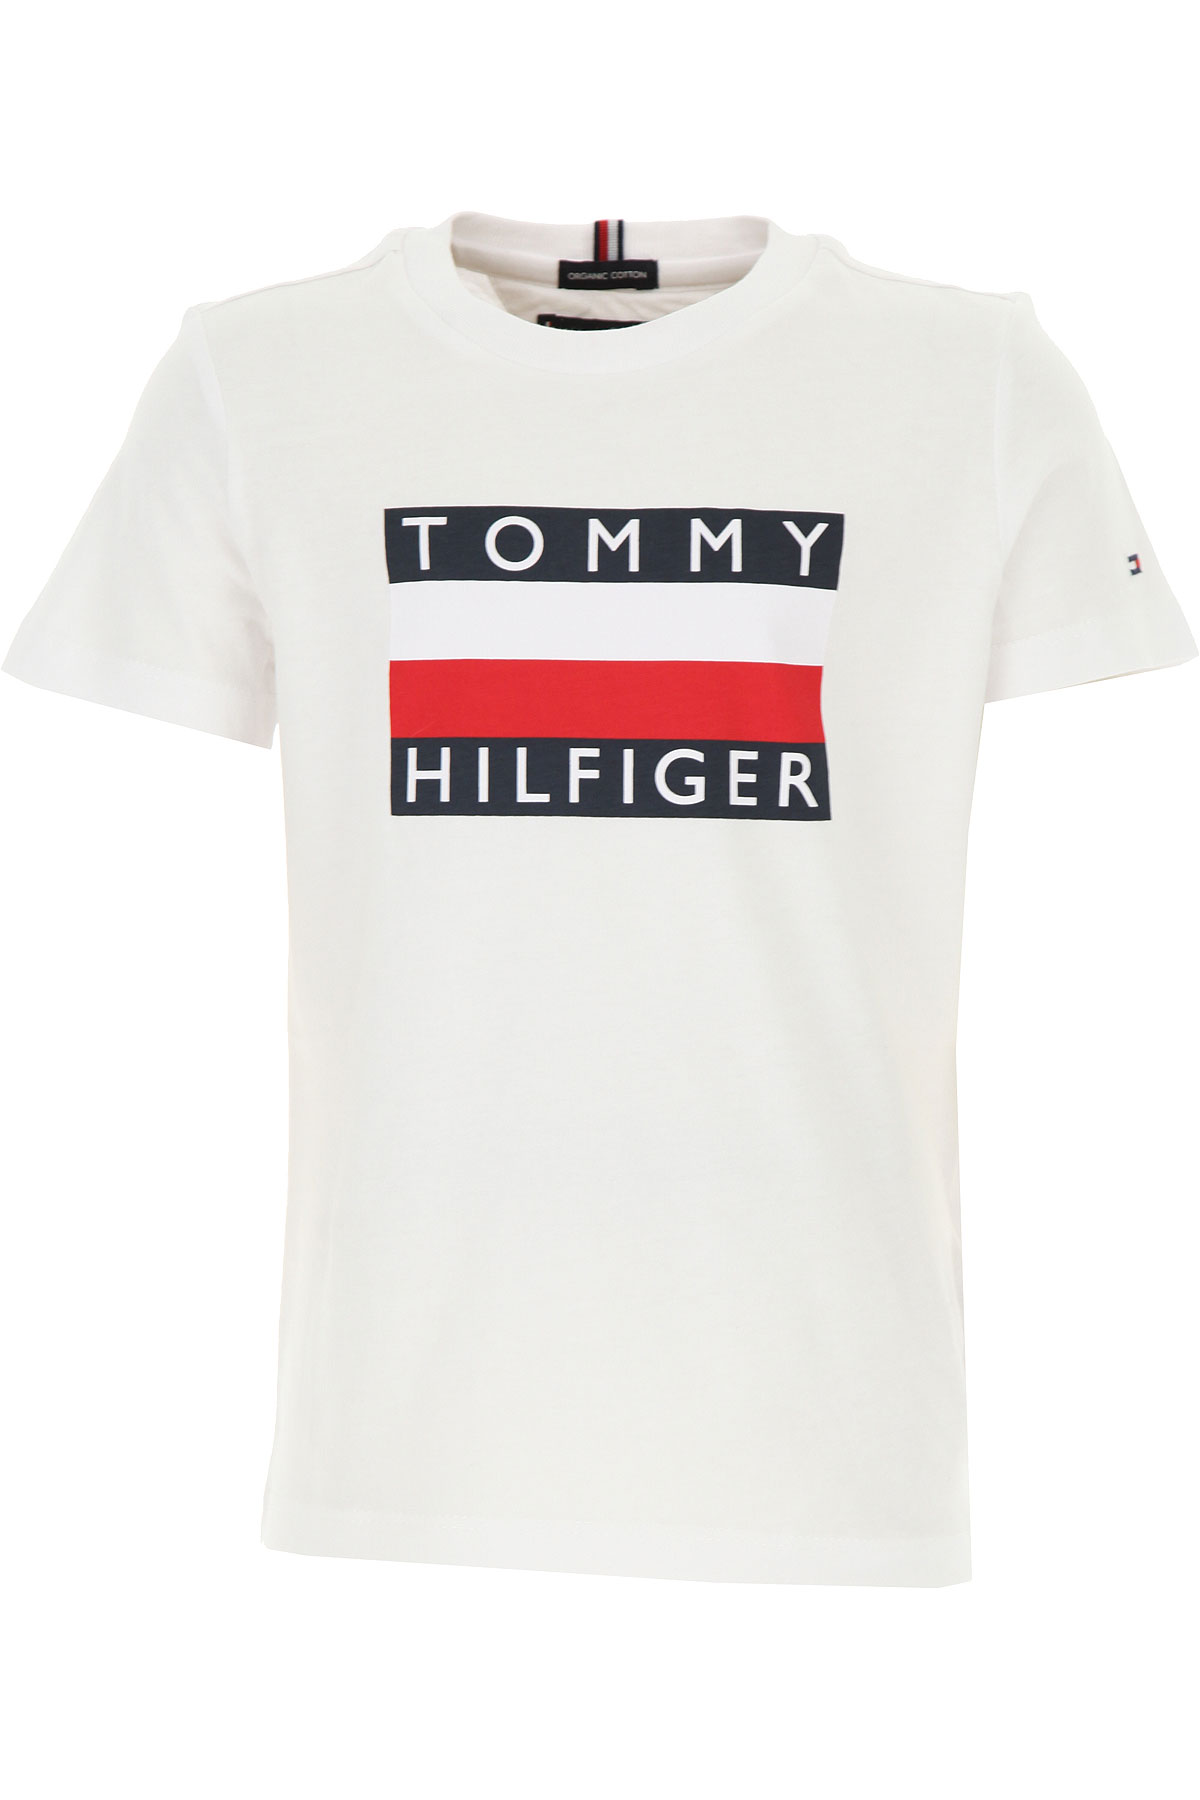 Tommy Hilfiger Kids T-Shirt for Boys On Sale, White, Organic Cotton, 2019, 10Y 4Y 8Y